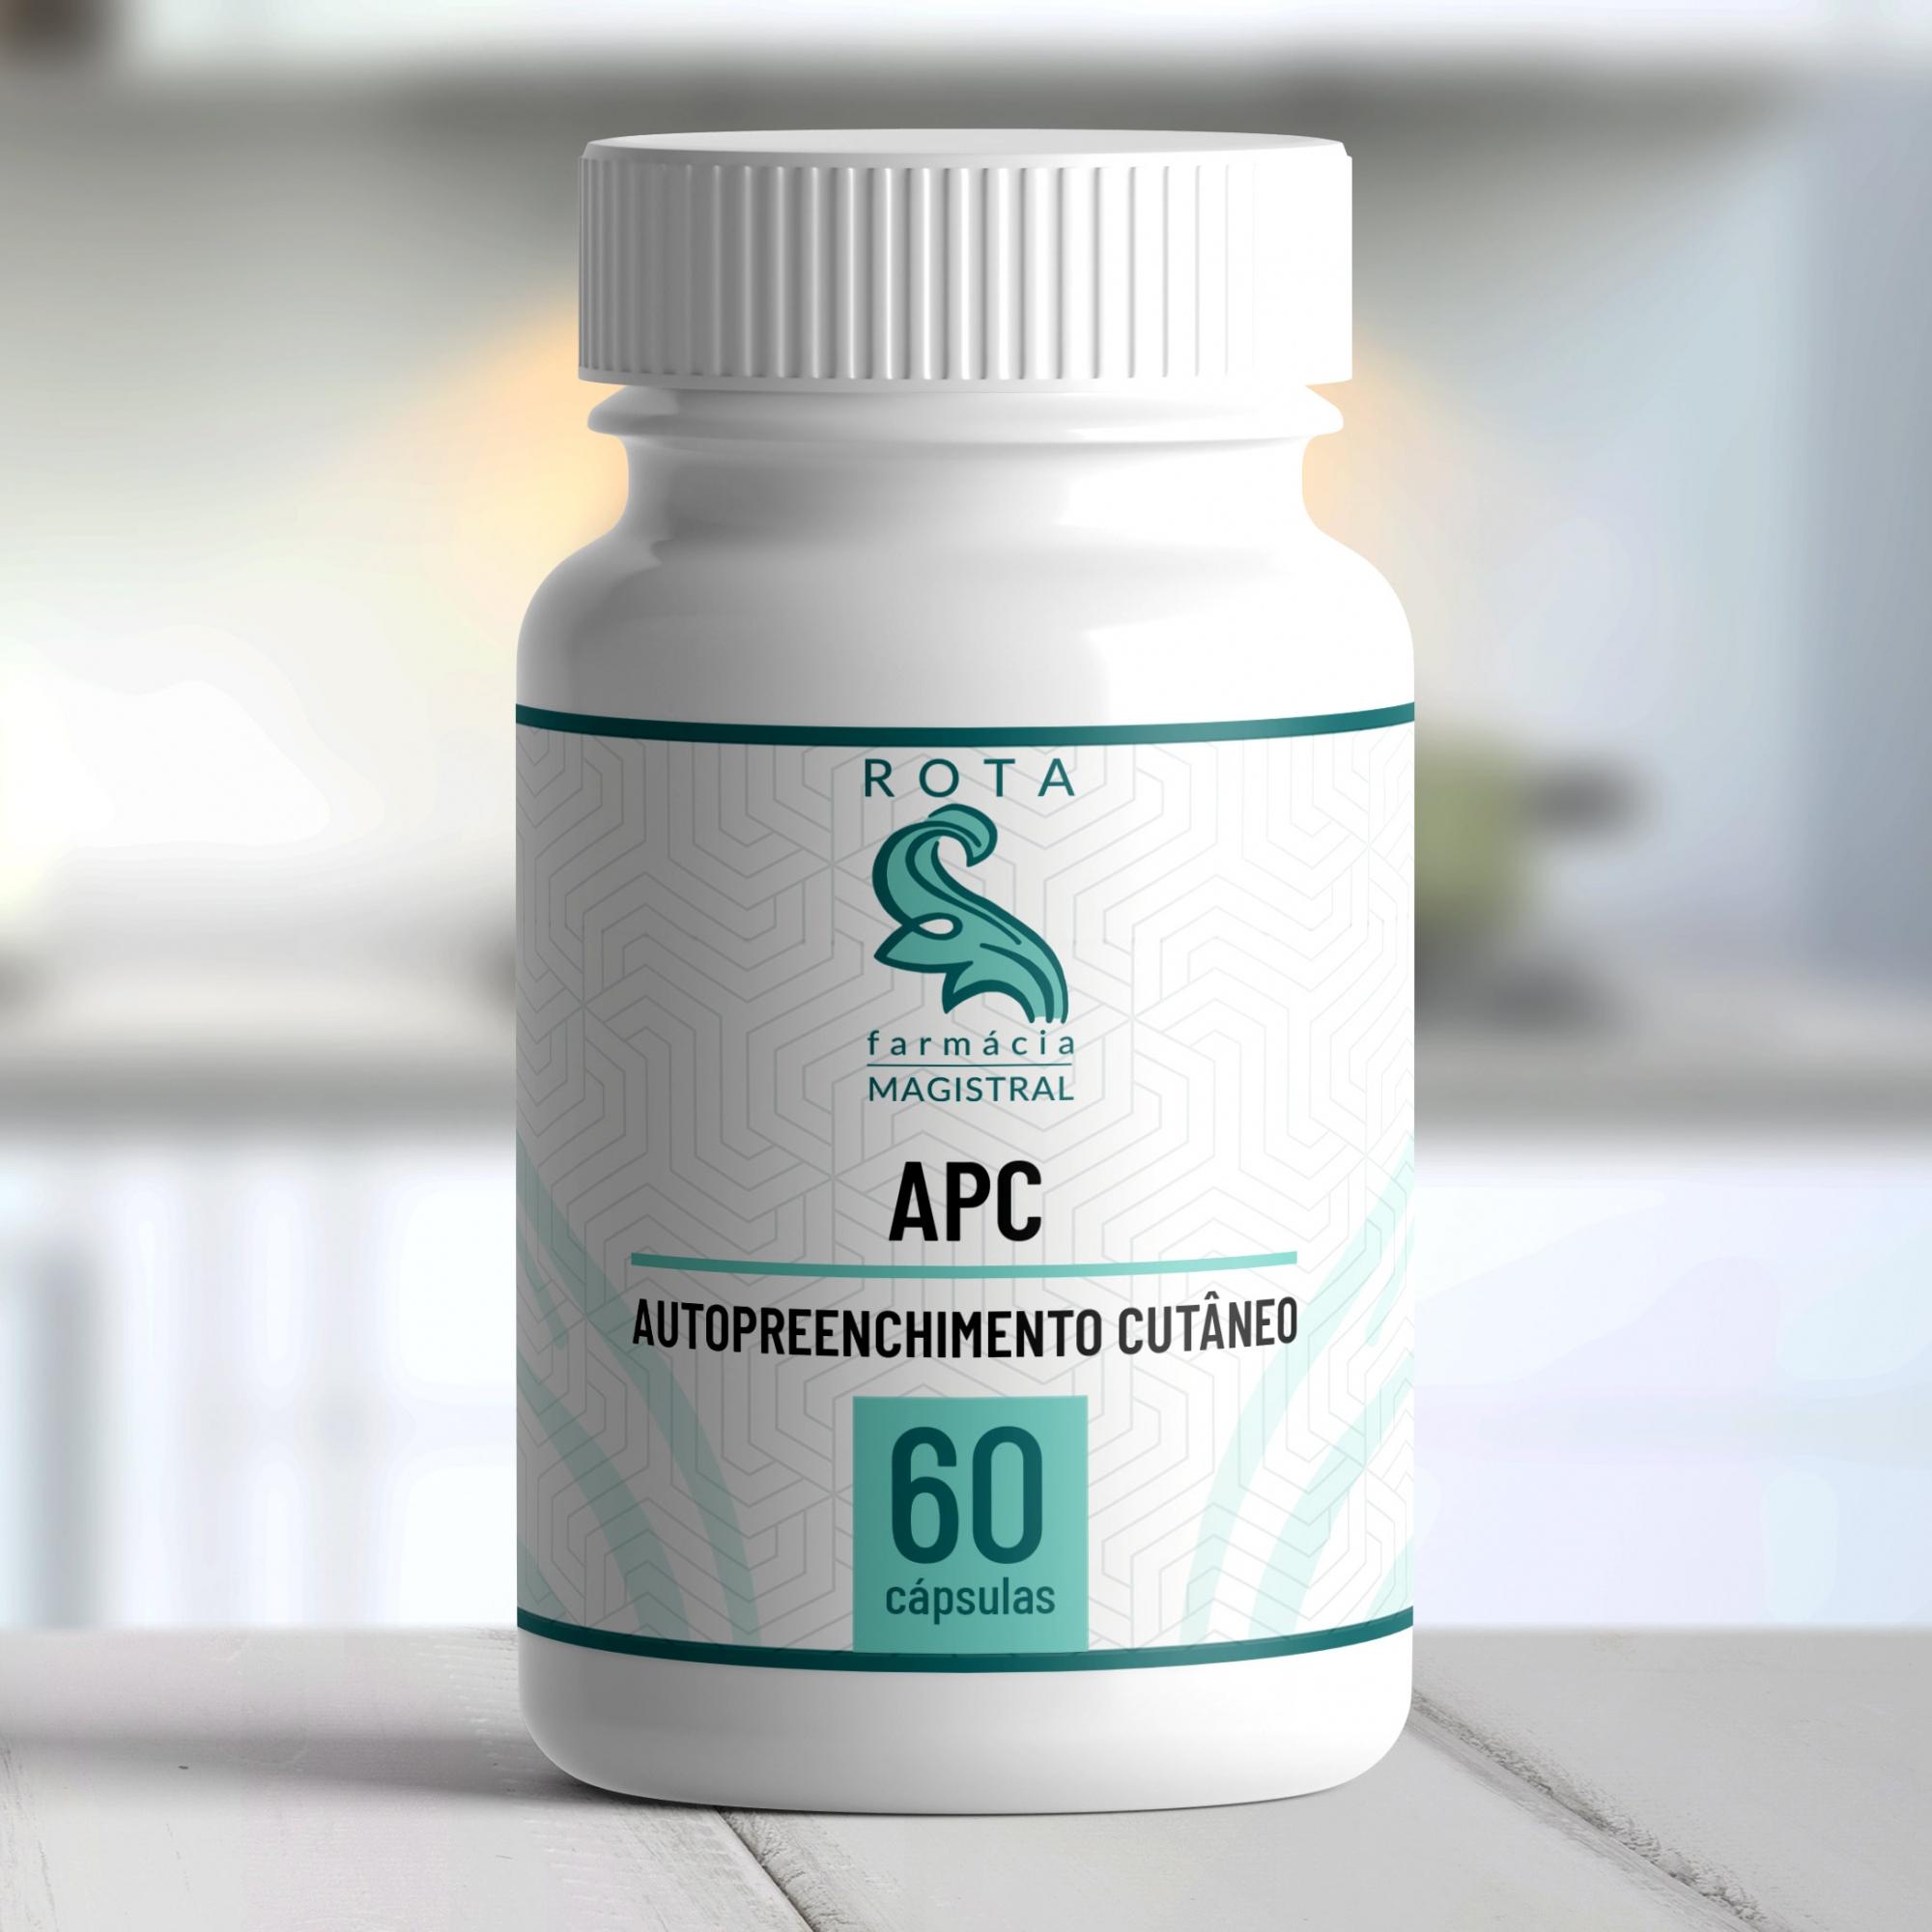 APC (Autopreenchimento cutâneo) 60 cápsulas